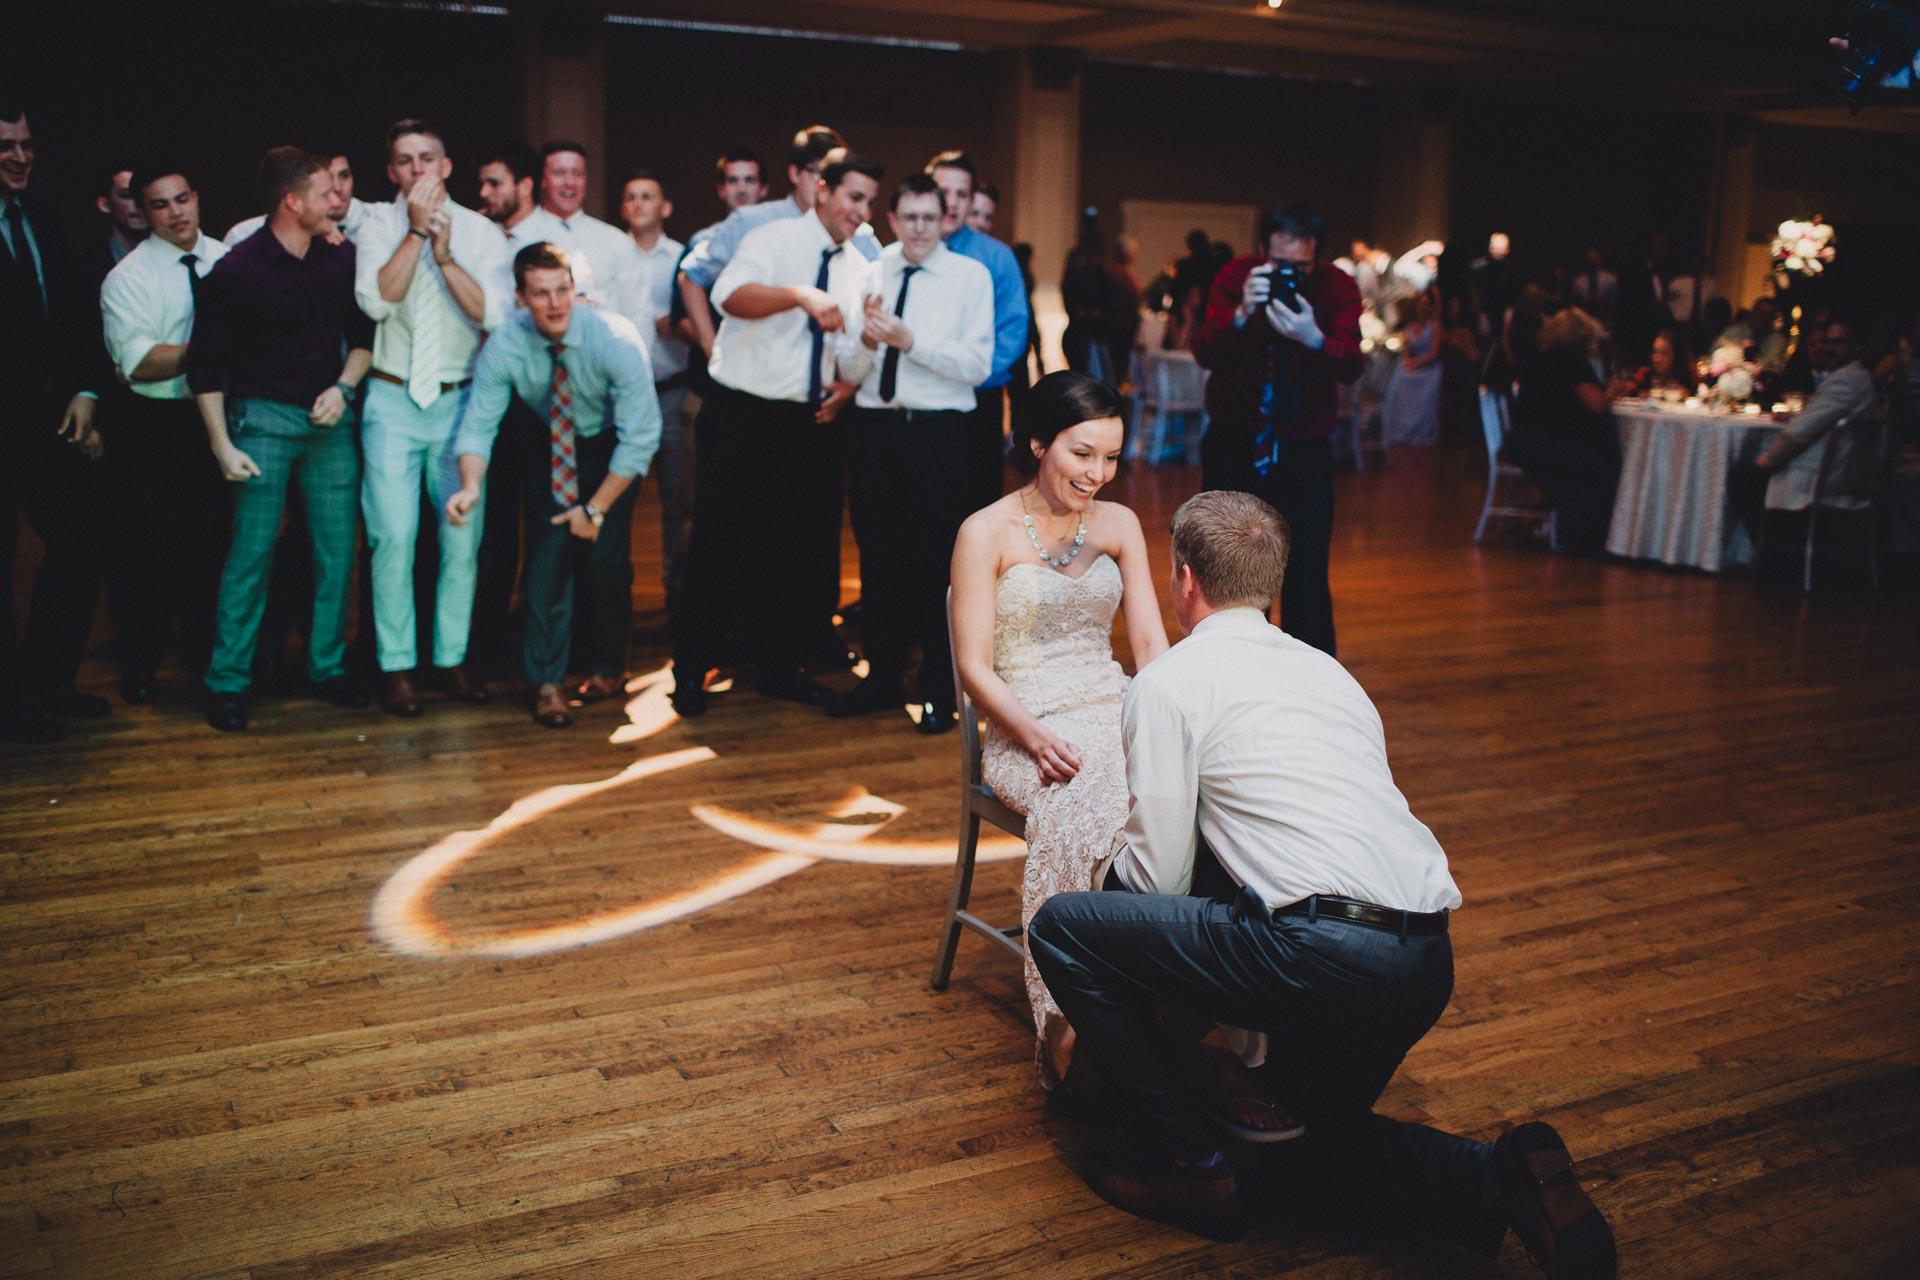 Julia-Michael-Cincinnati-Music-Hall-Wedding-135@2x.jpg